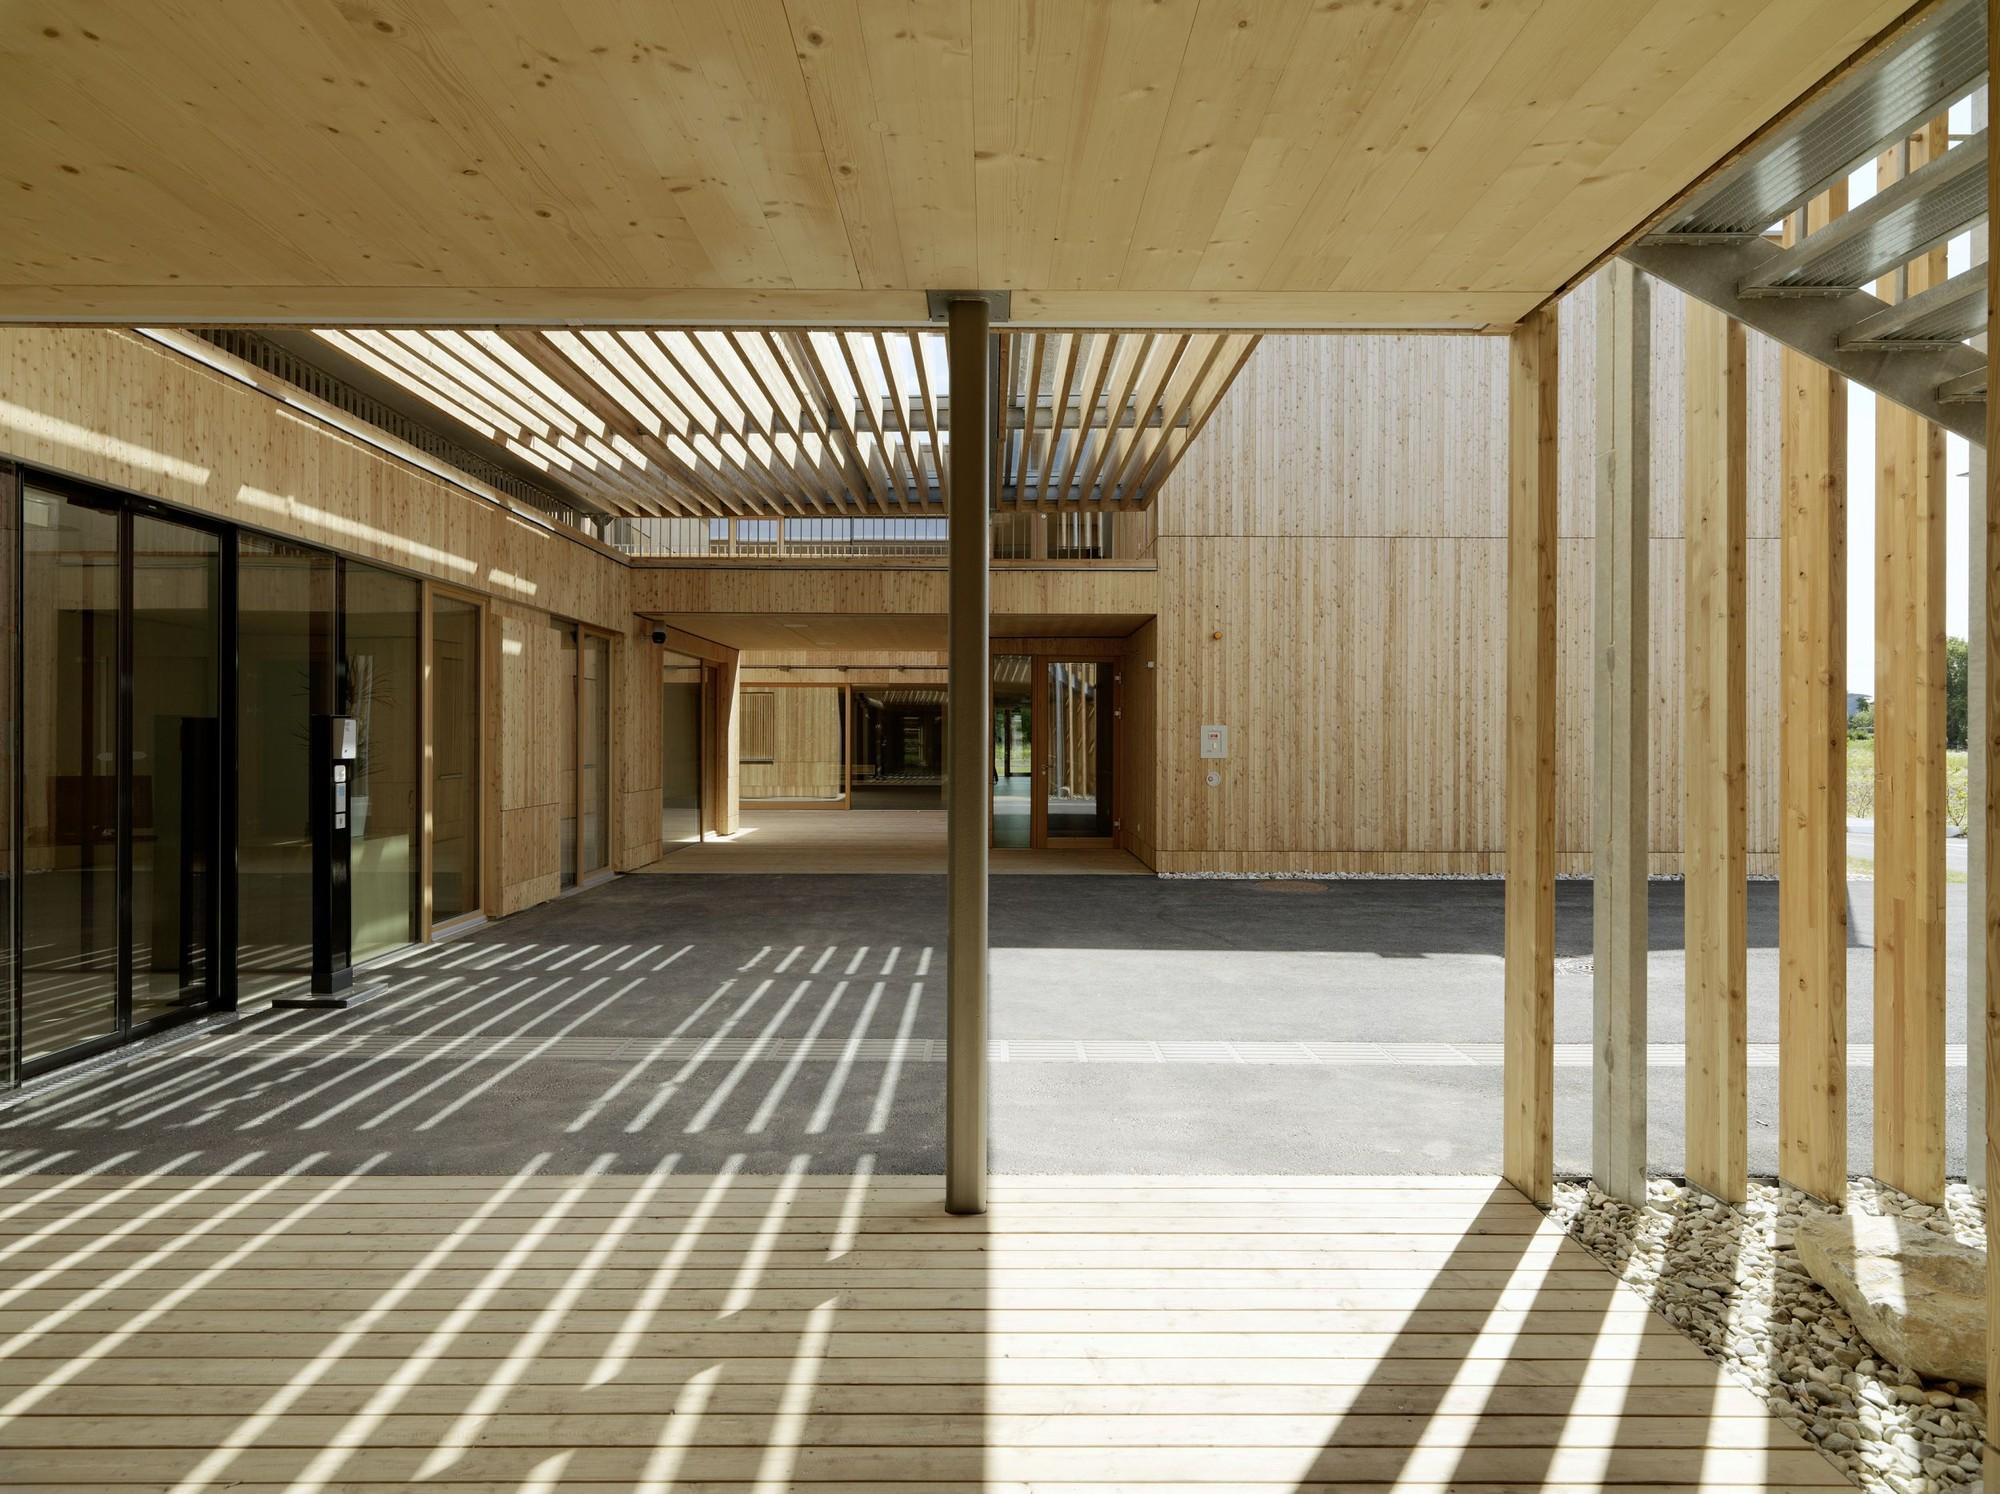 Gallery of Peter Rosegger Nursing Home / Dietger Wissounig